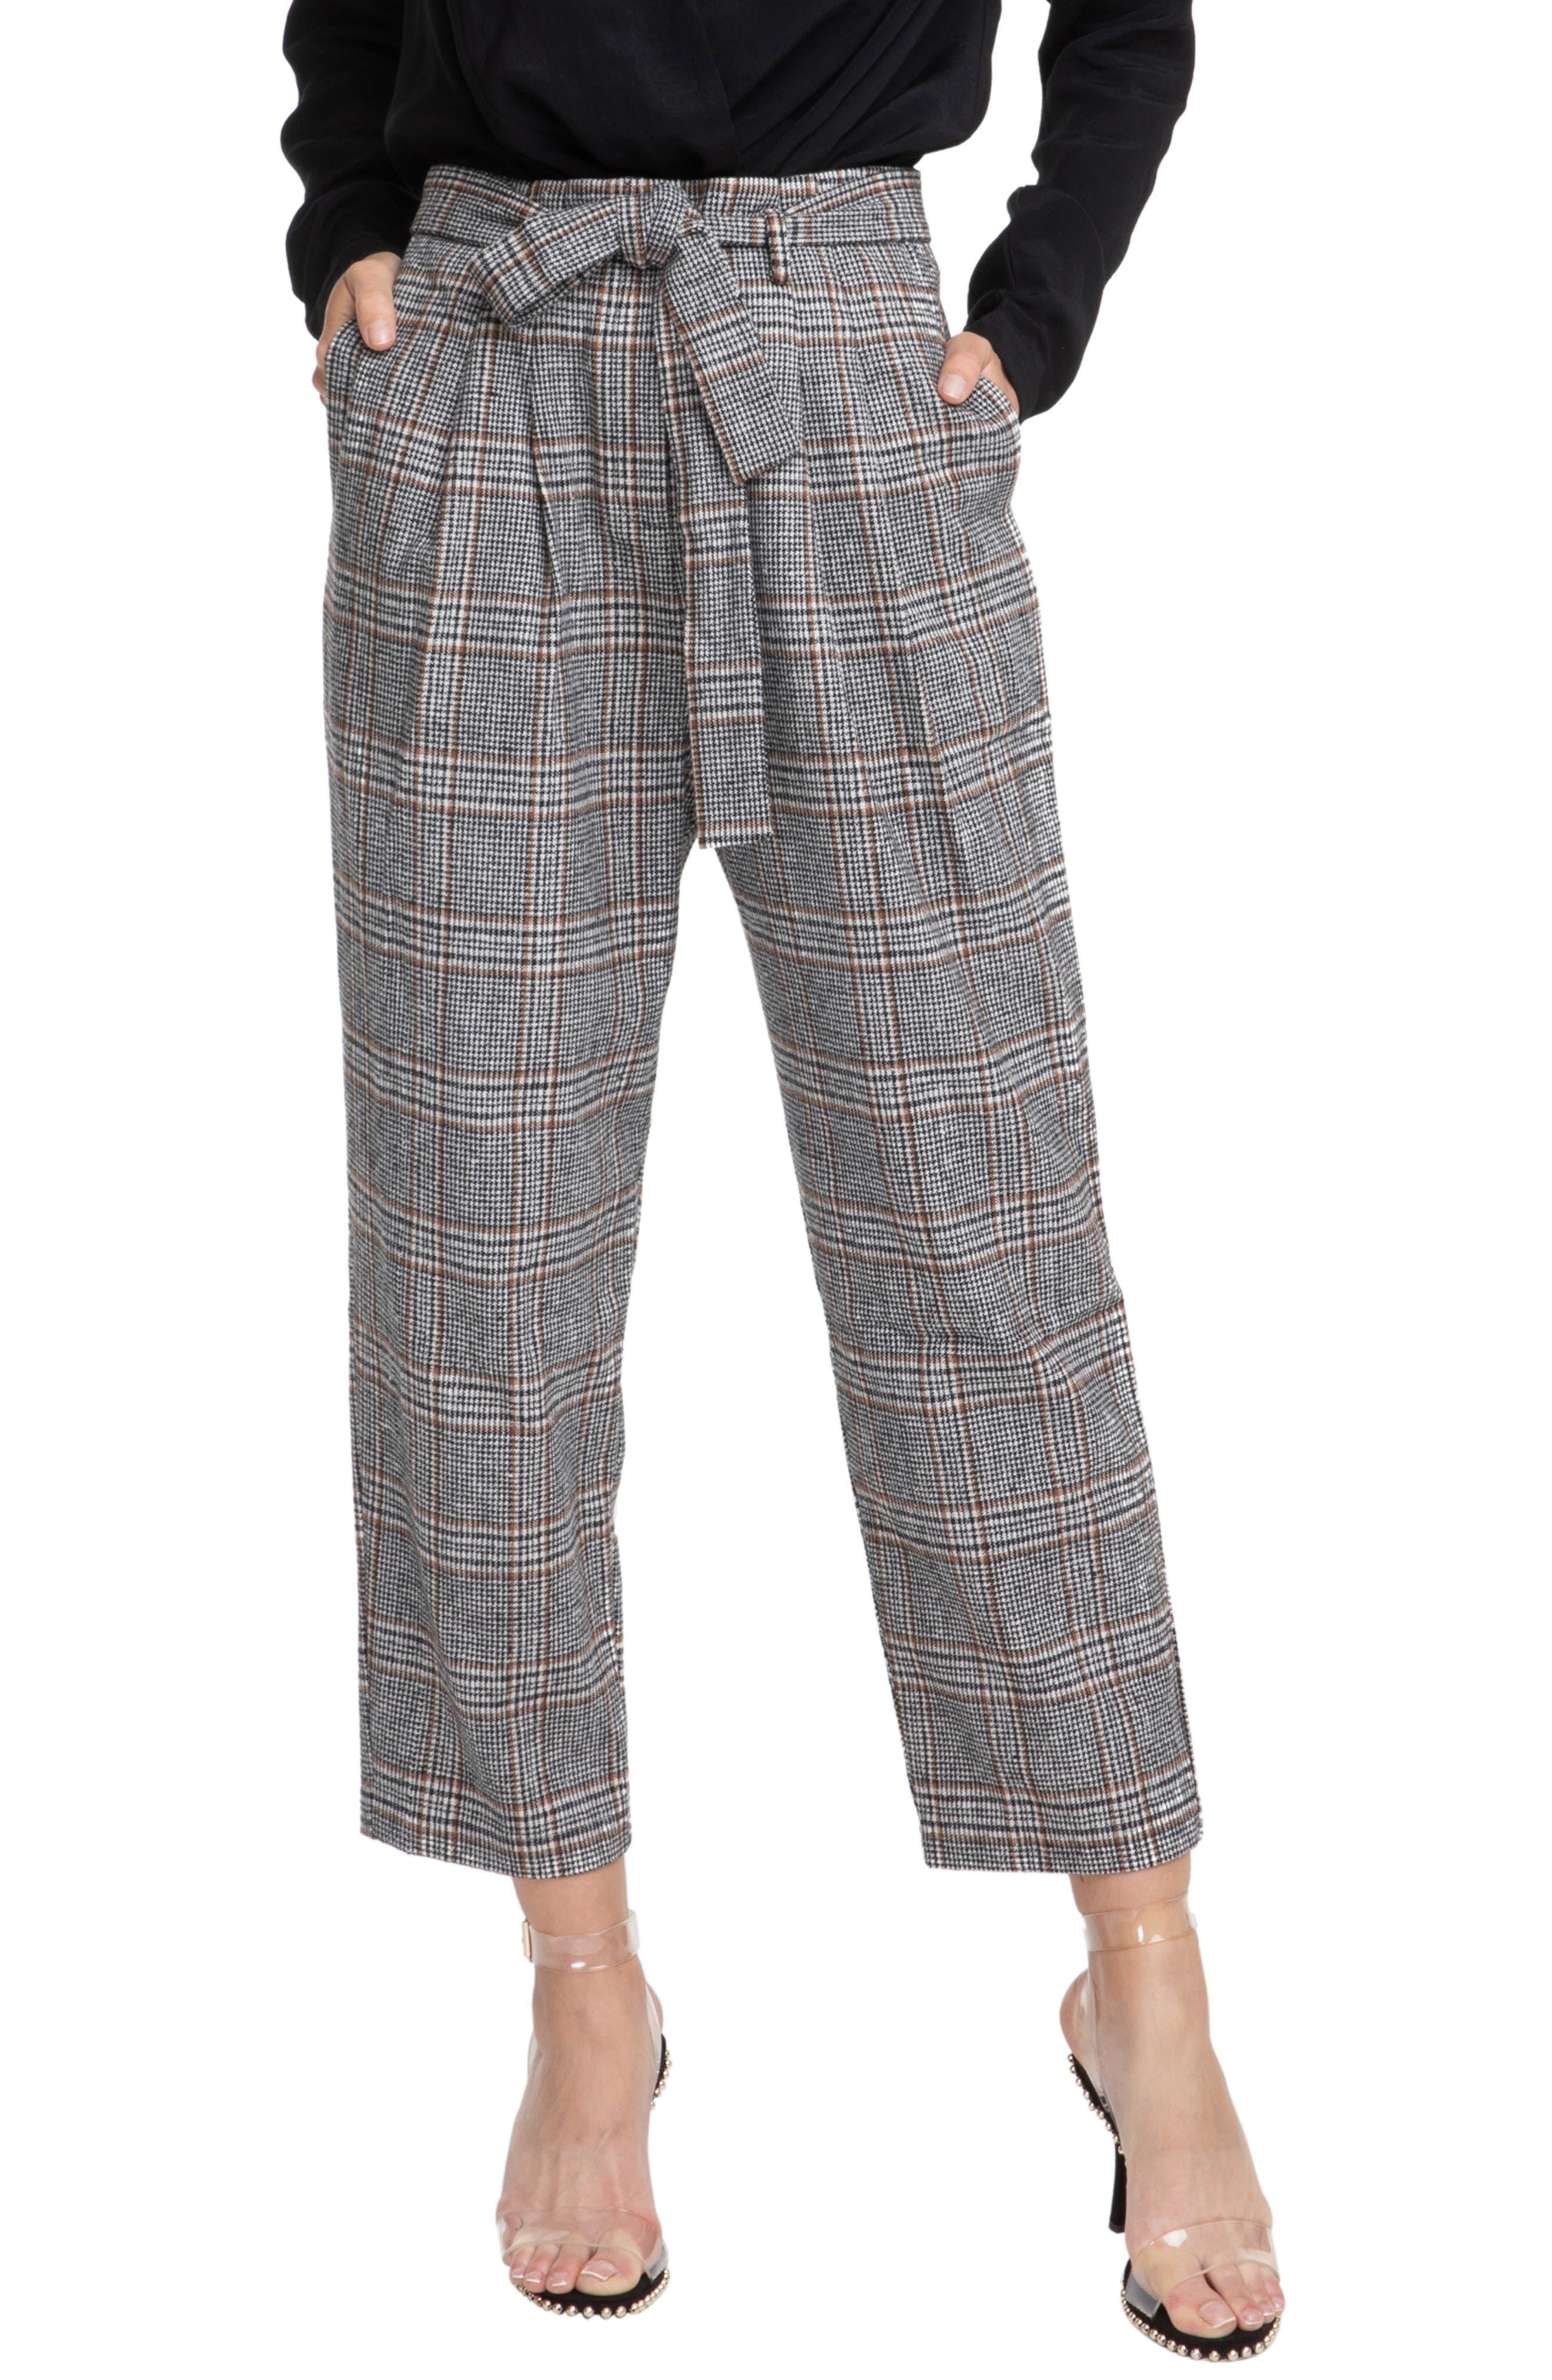 ASTR Tie Waist Trousers in Black/ Brown Combo